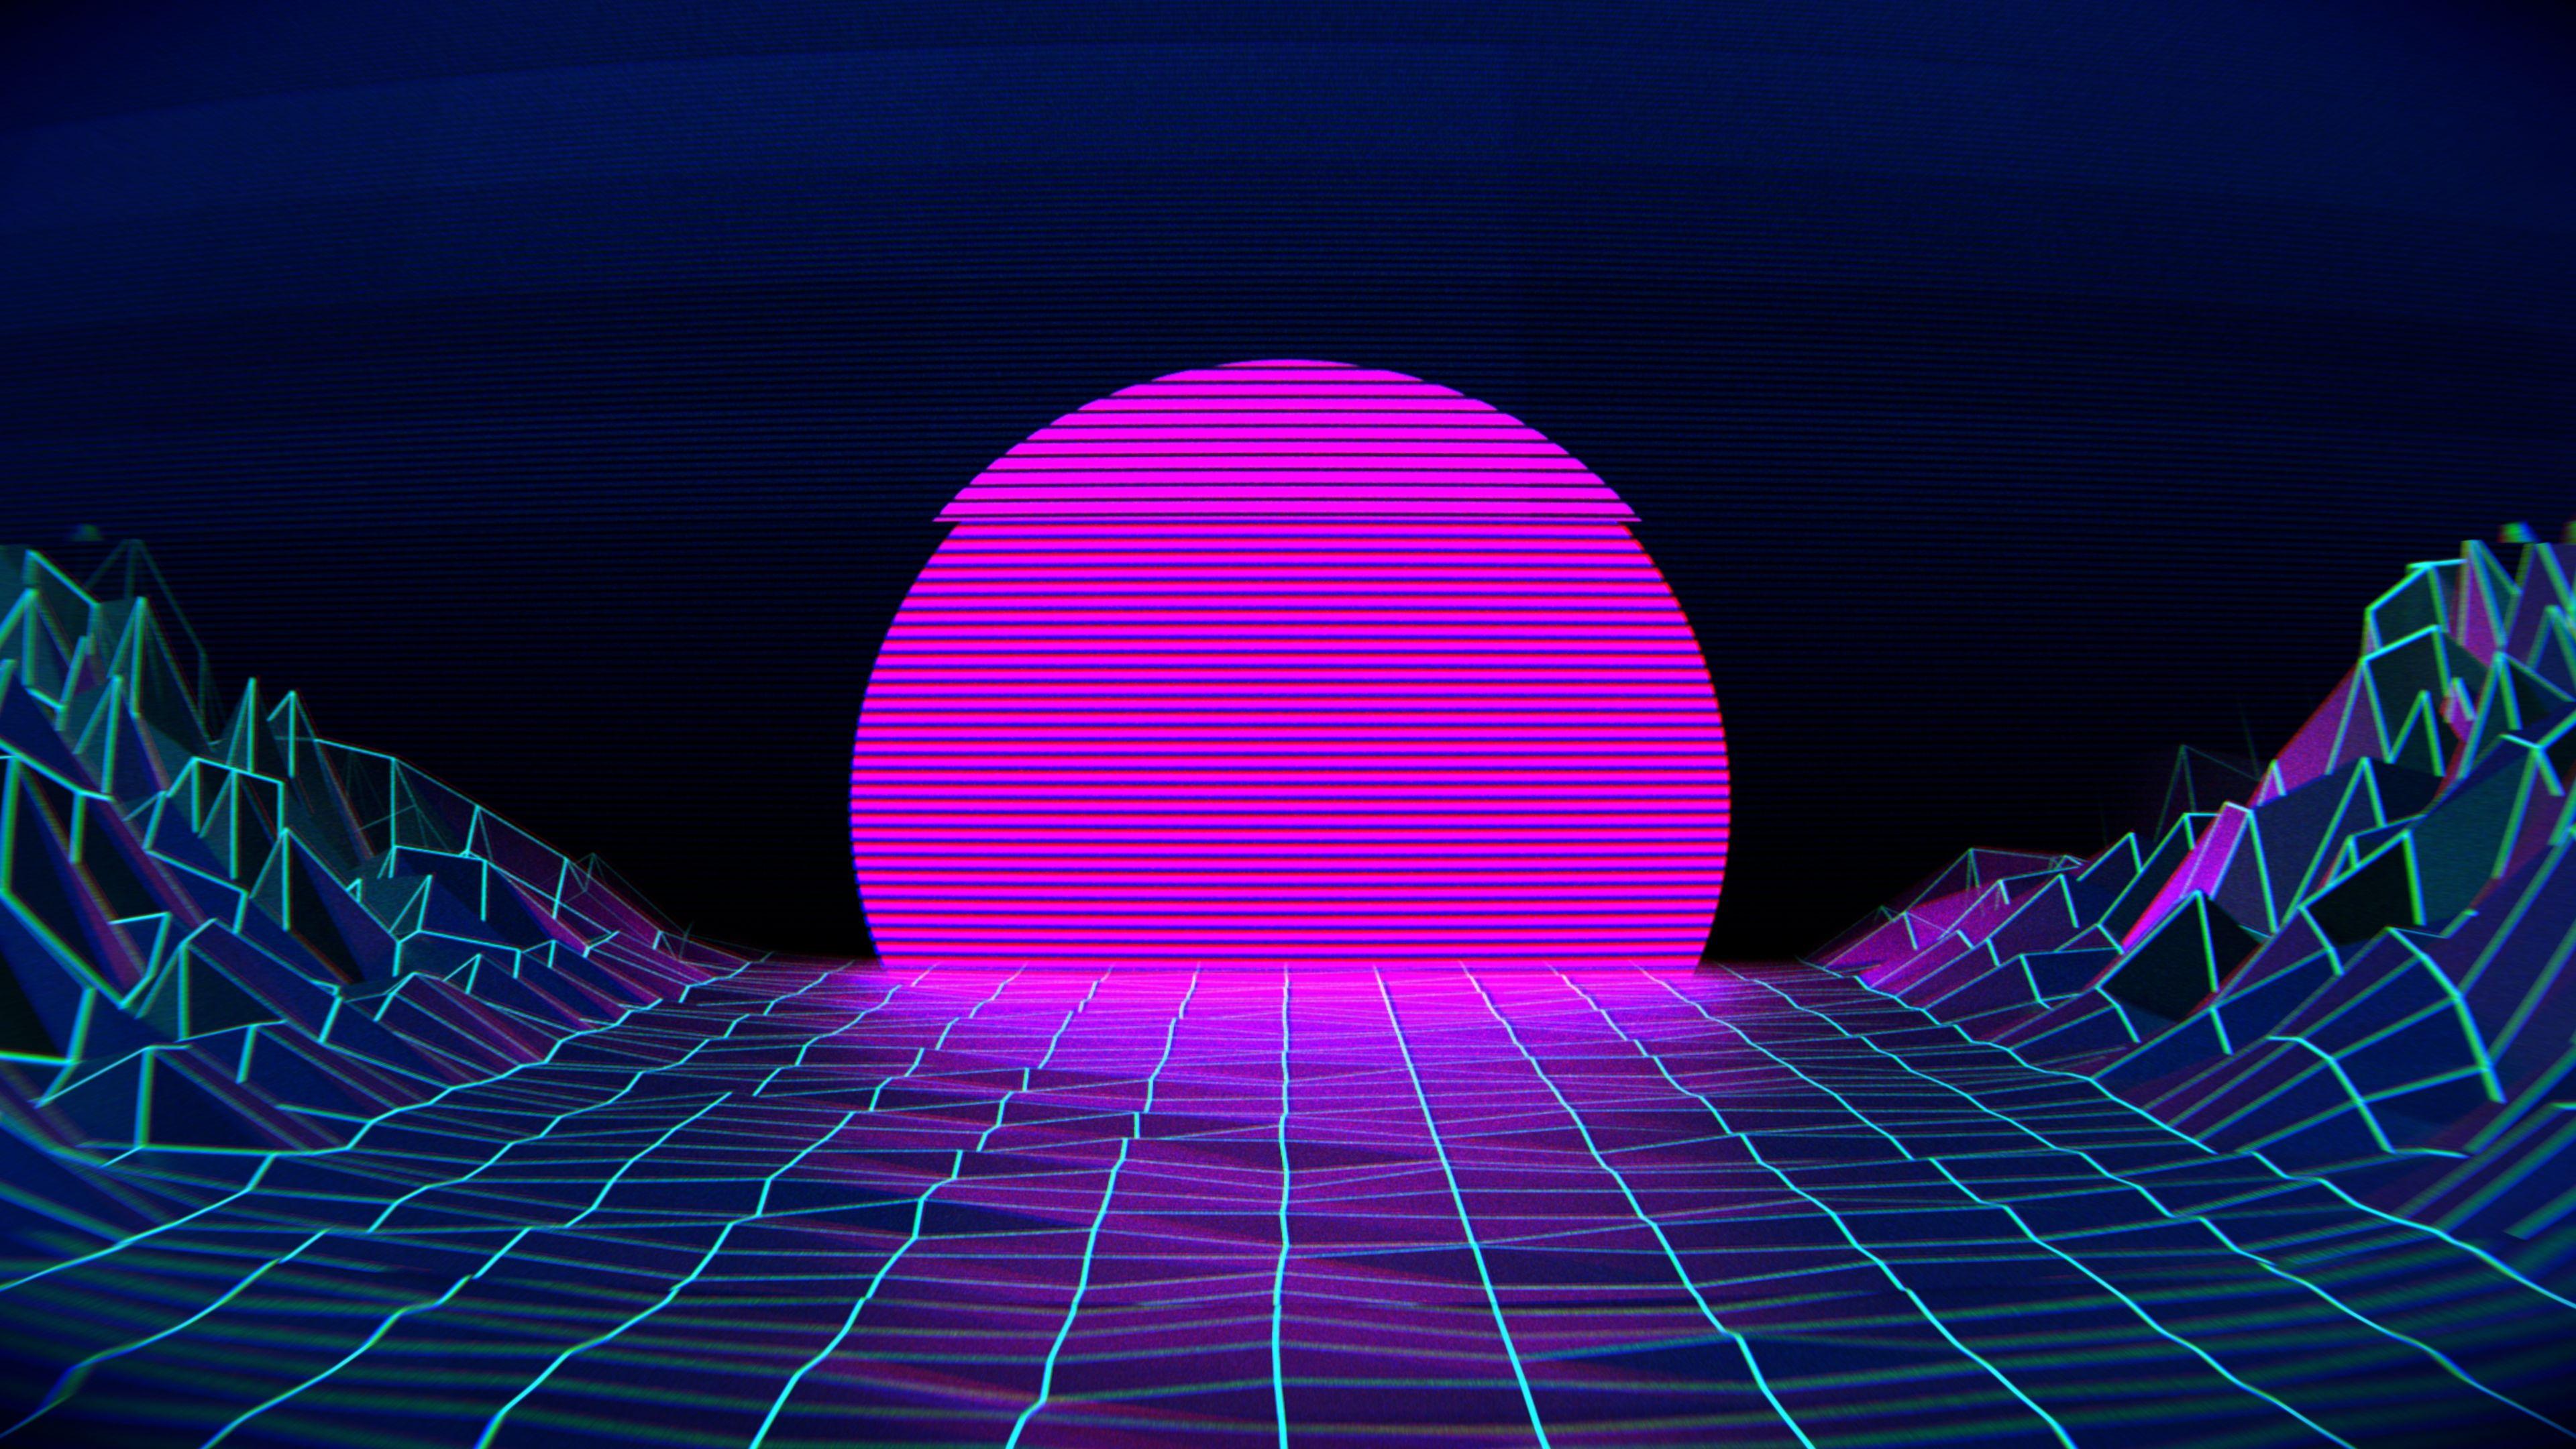 1080x1920 82+ purple phone wallpapers on wallpaperplay>. 4K Vaporwave | Vaporwave wallpaper, Vaporwave, Iphone ...